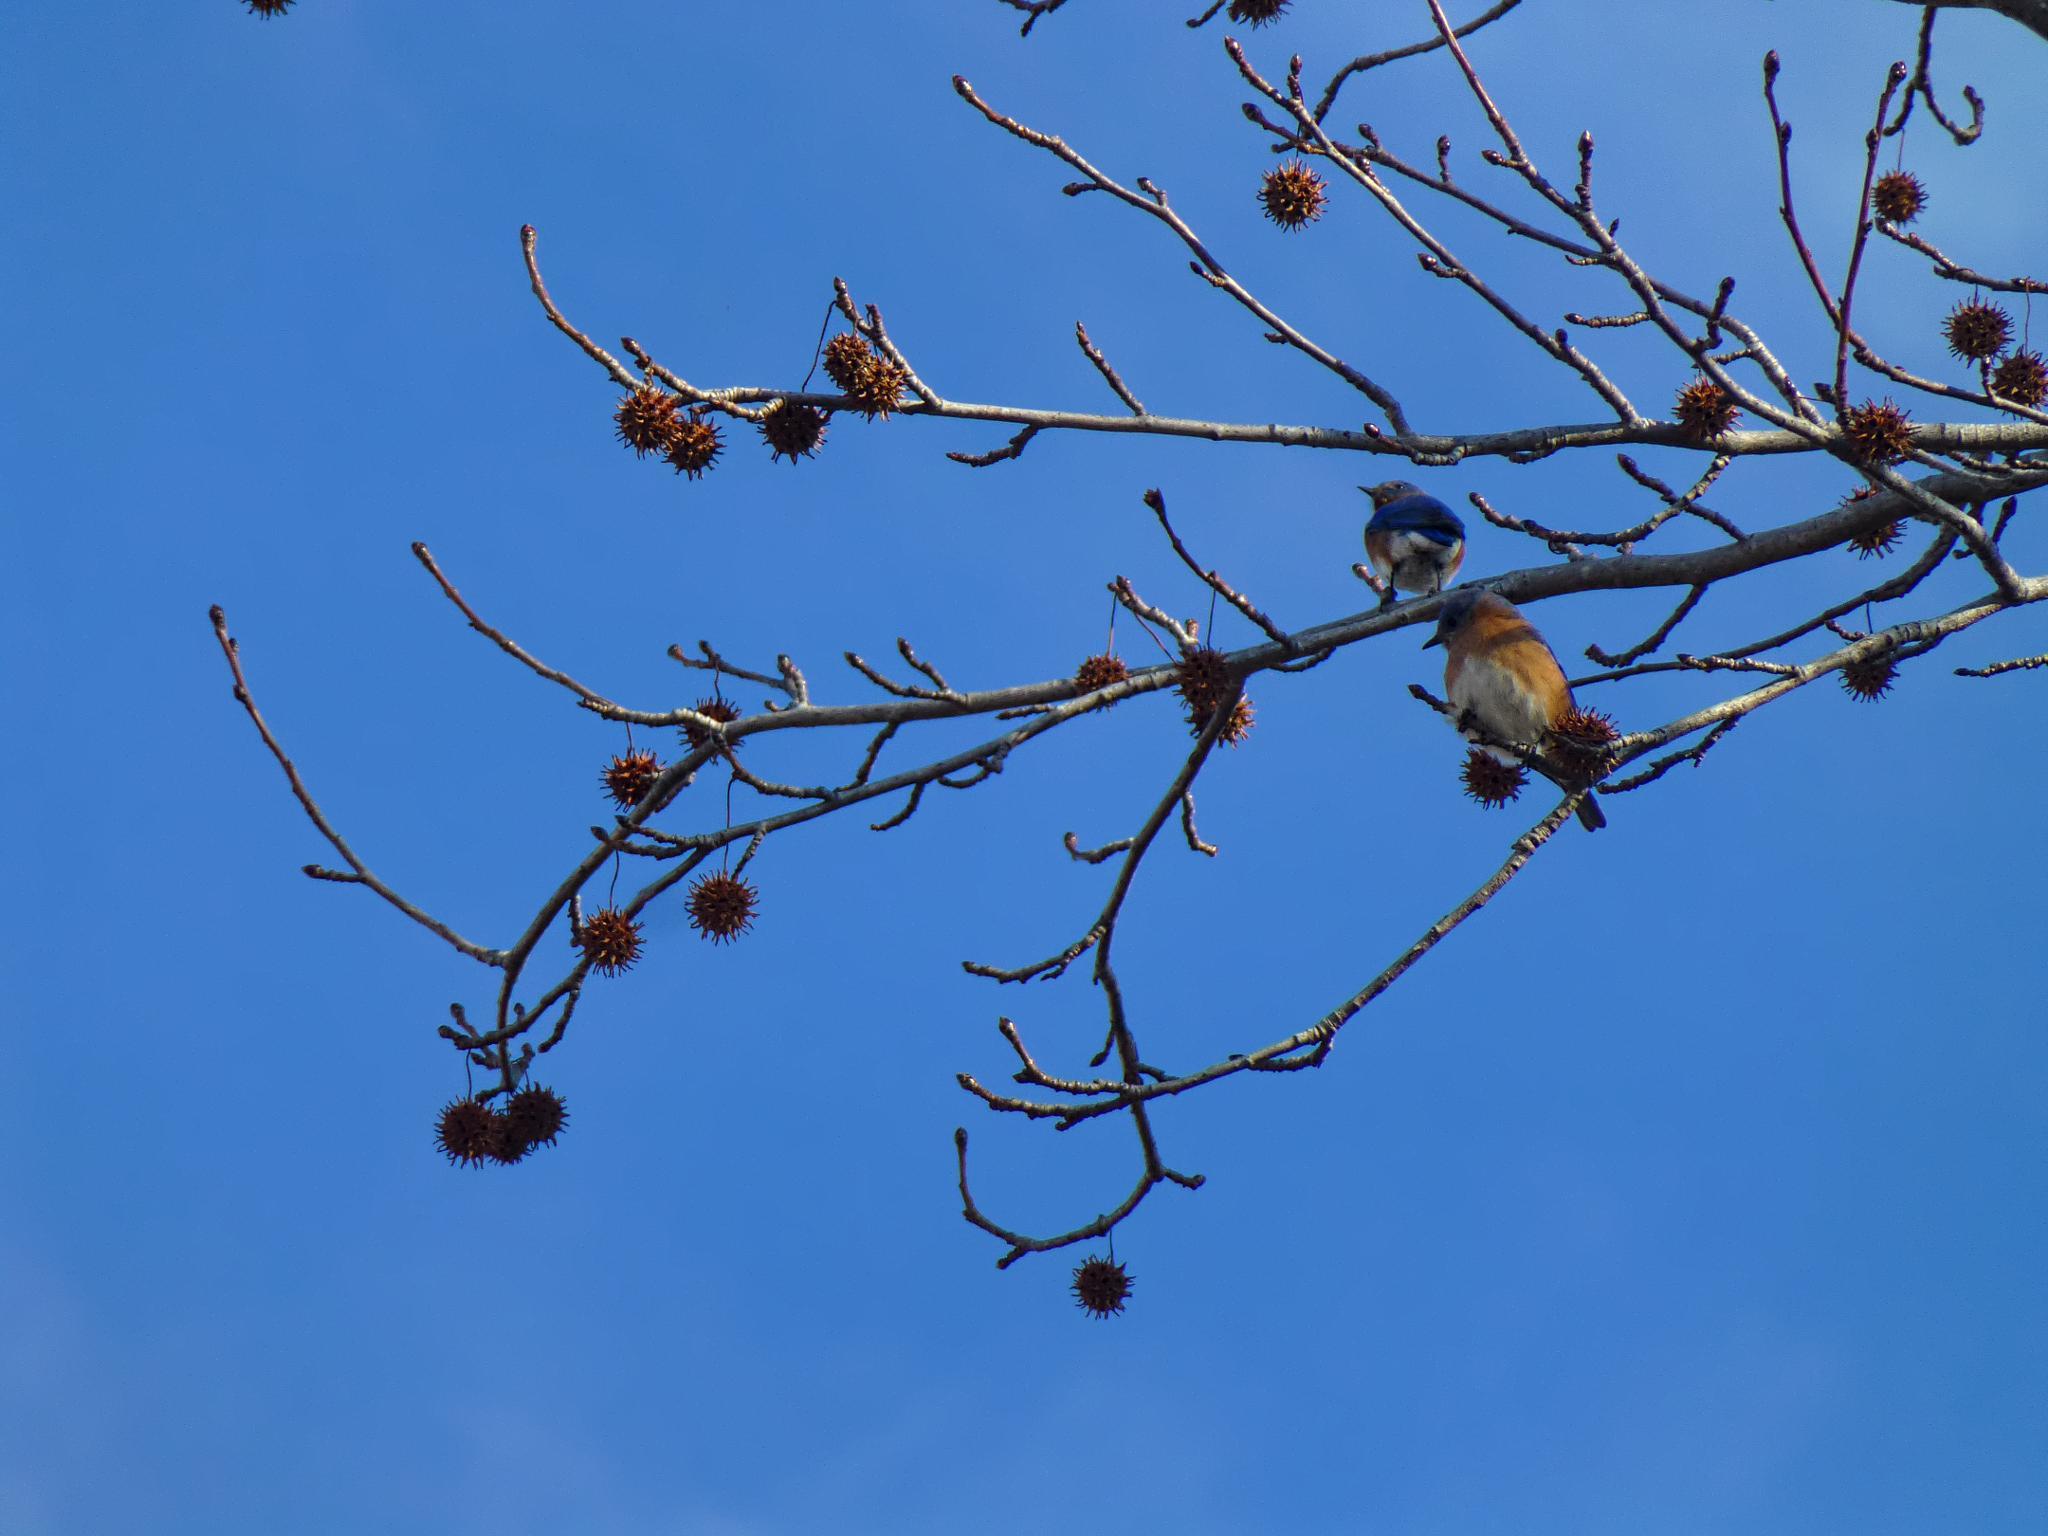 BLUE BIRDS AND BLUE SKY by Catherine Wegener